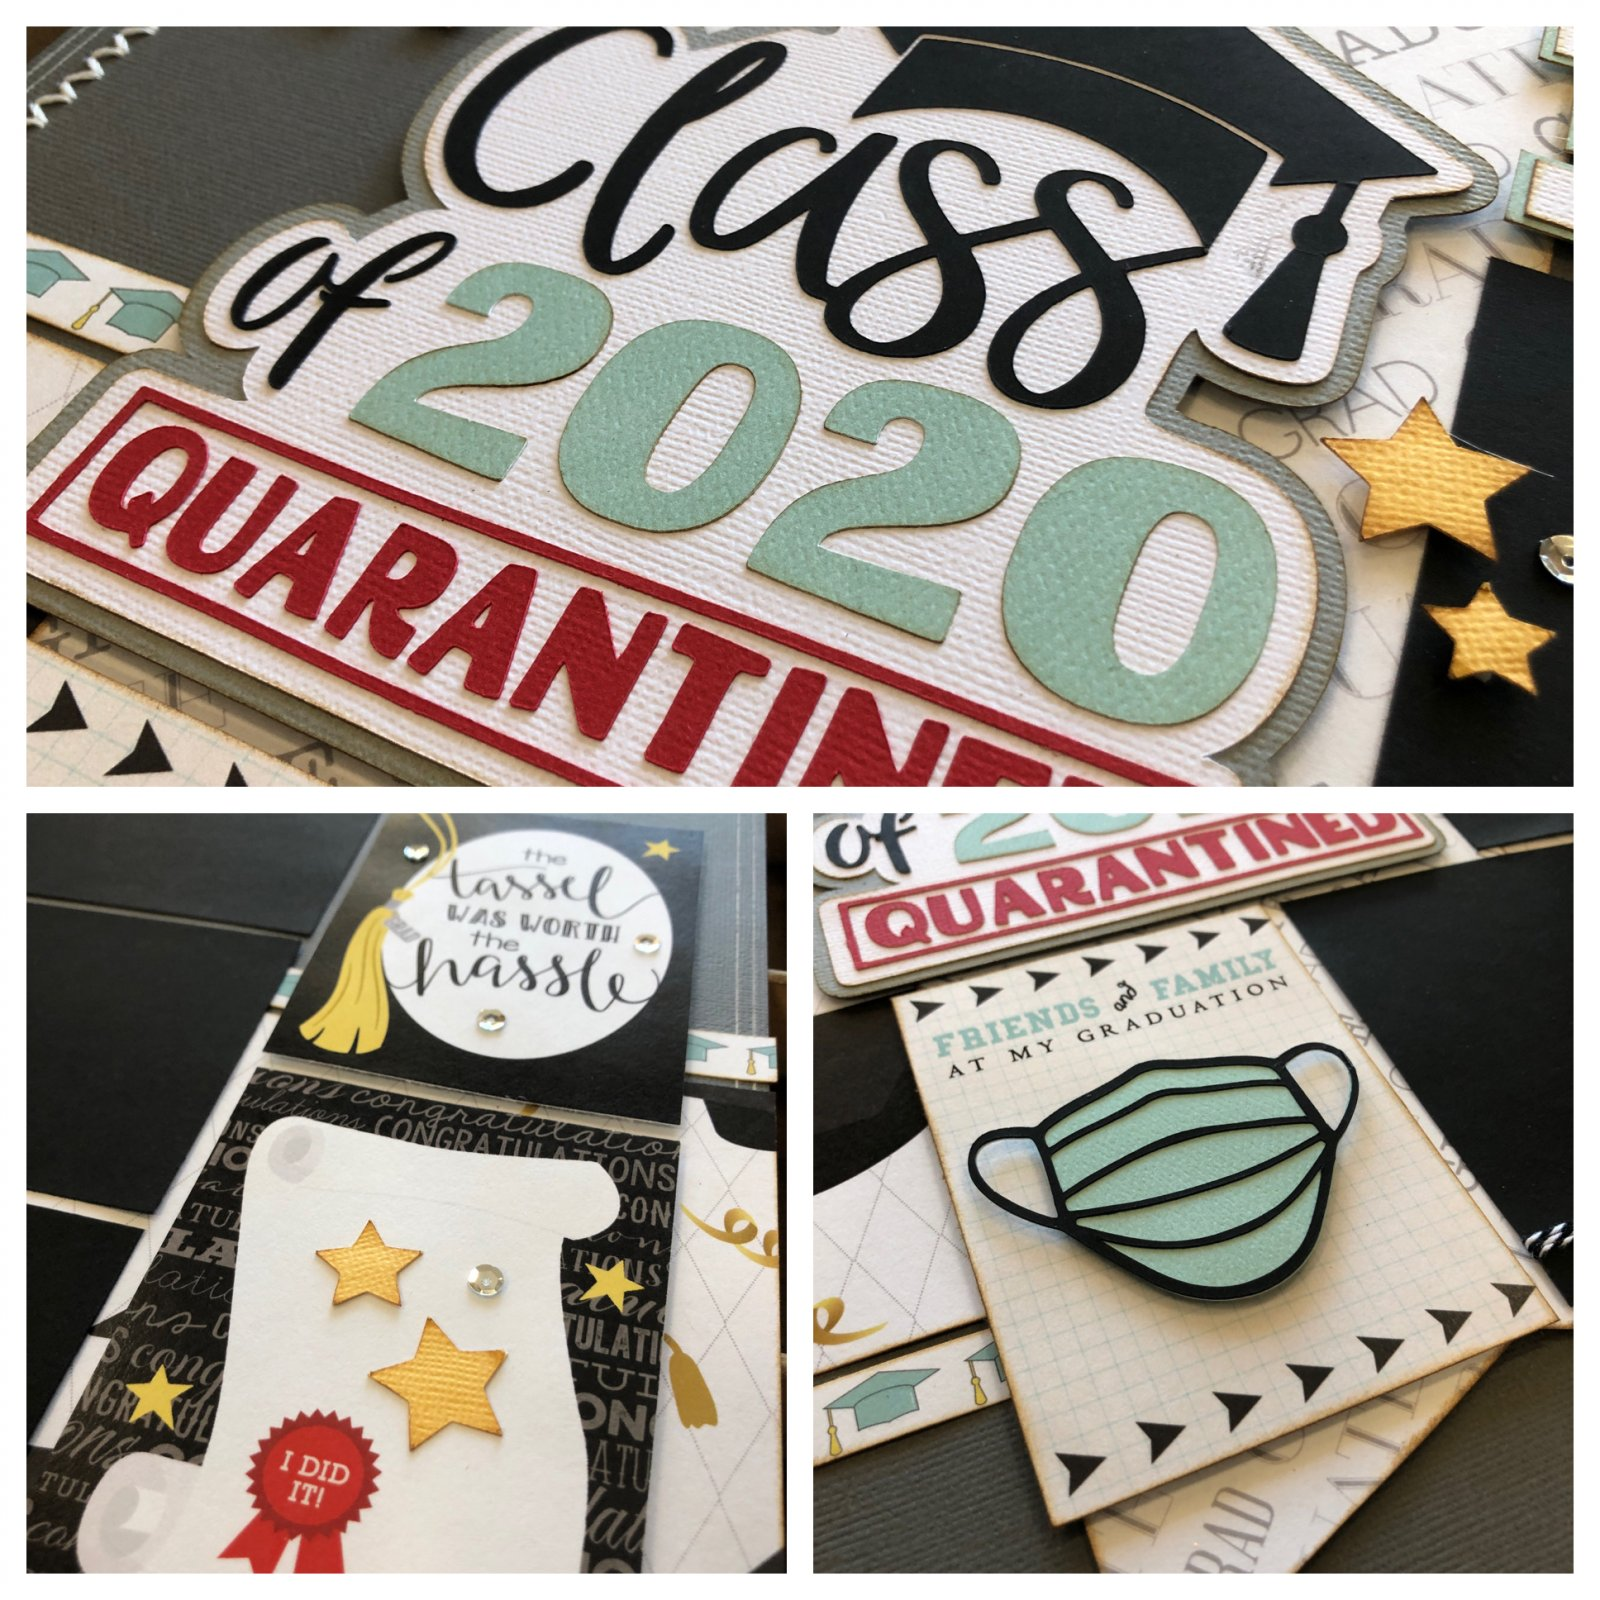 Class Of 2020 Quarantined Kit